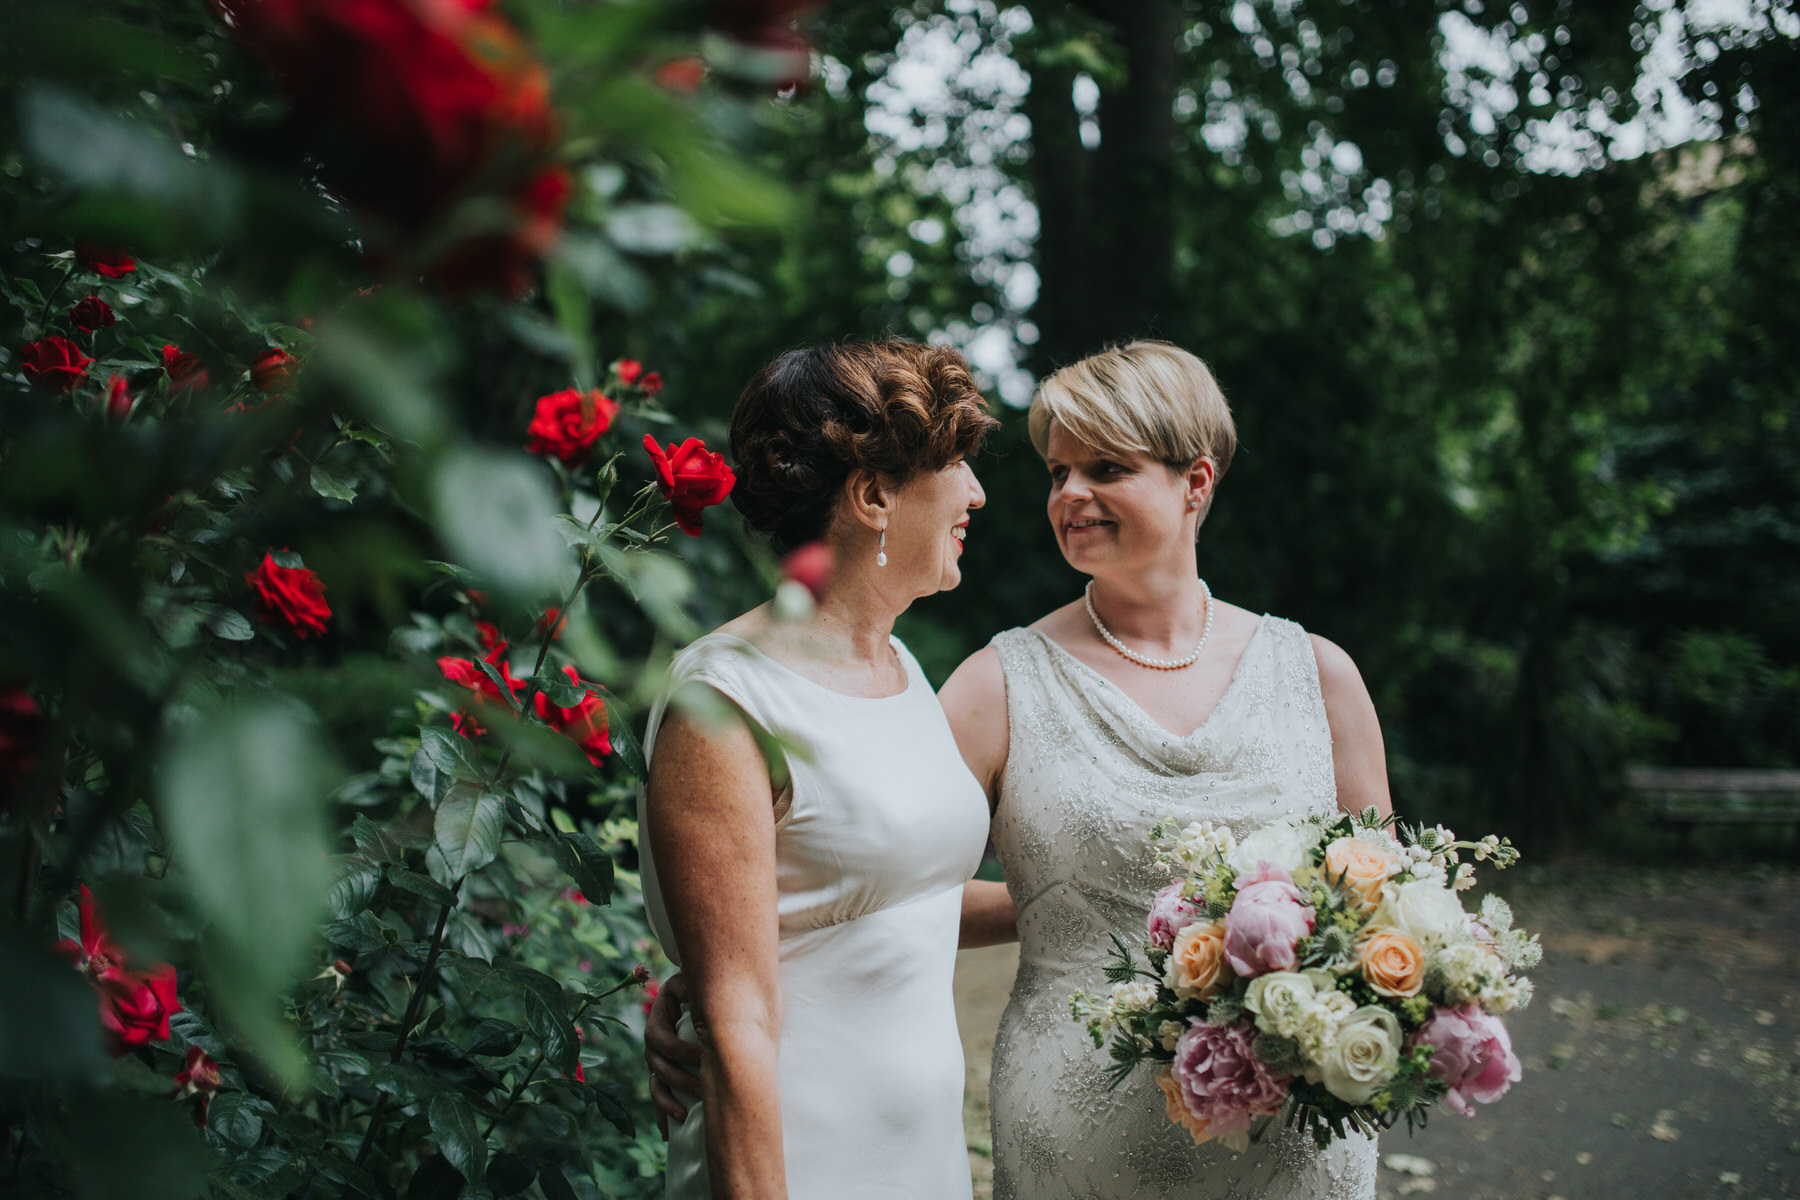 193 relaxed natural two brides wedding portrait Islington park.jpg